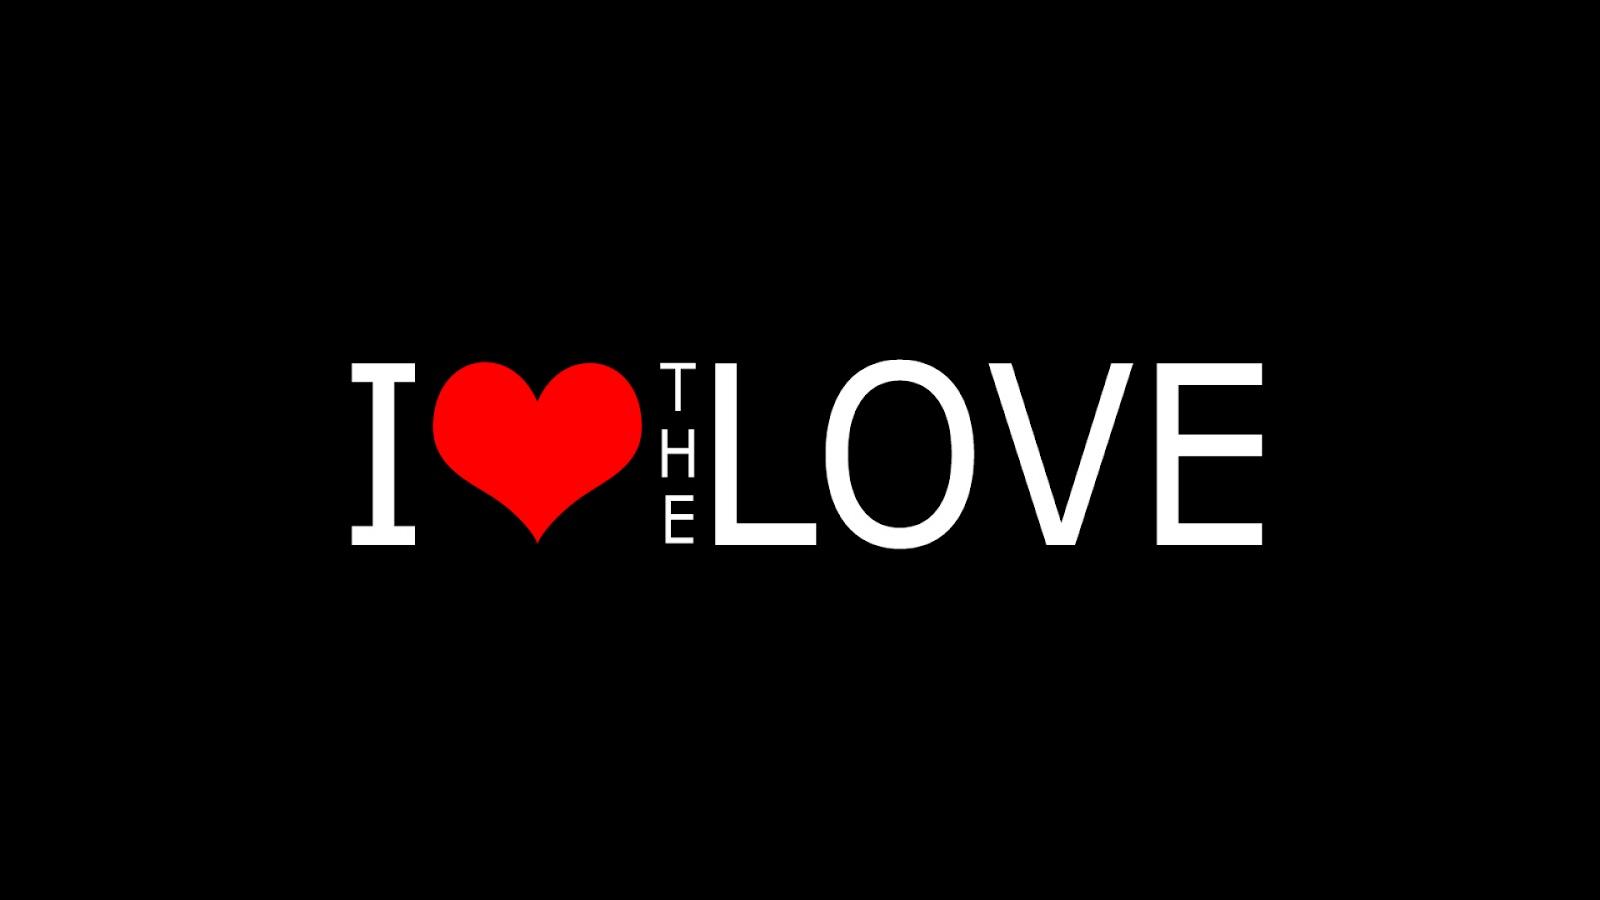 I'm In Love Wallpaper | Wallpaper for desktop